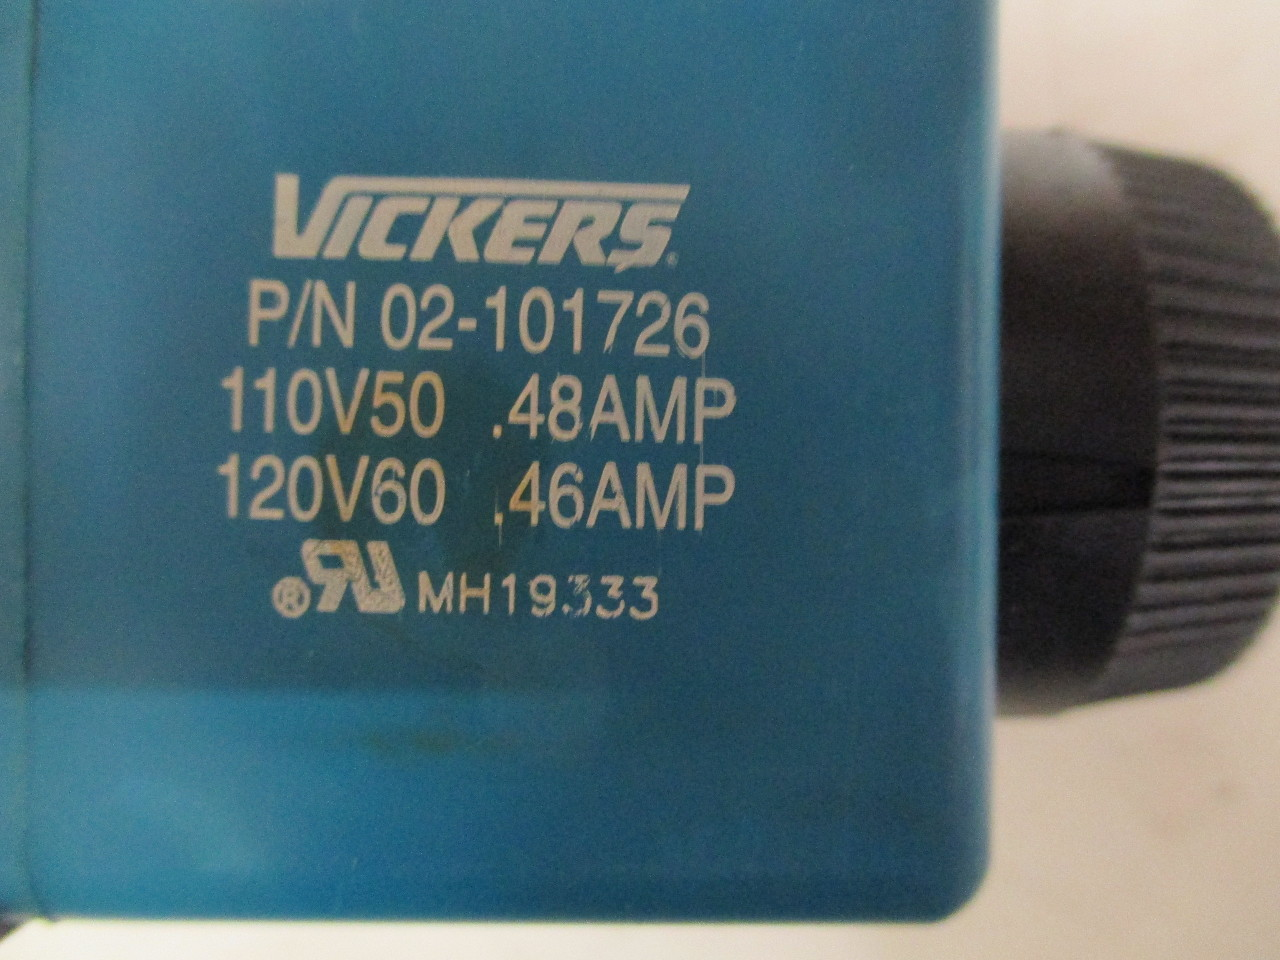 Vickers directional hydraulic control valve DG4V-3S-2N-M-U-B5-60  W/ 2 P/N 02-101726